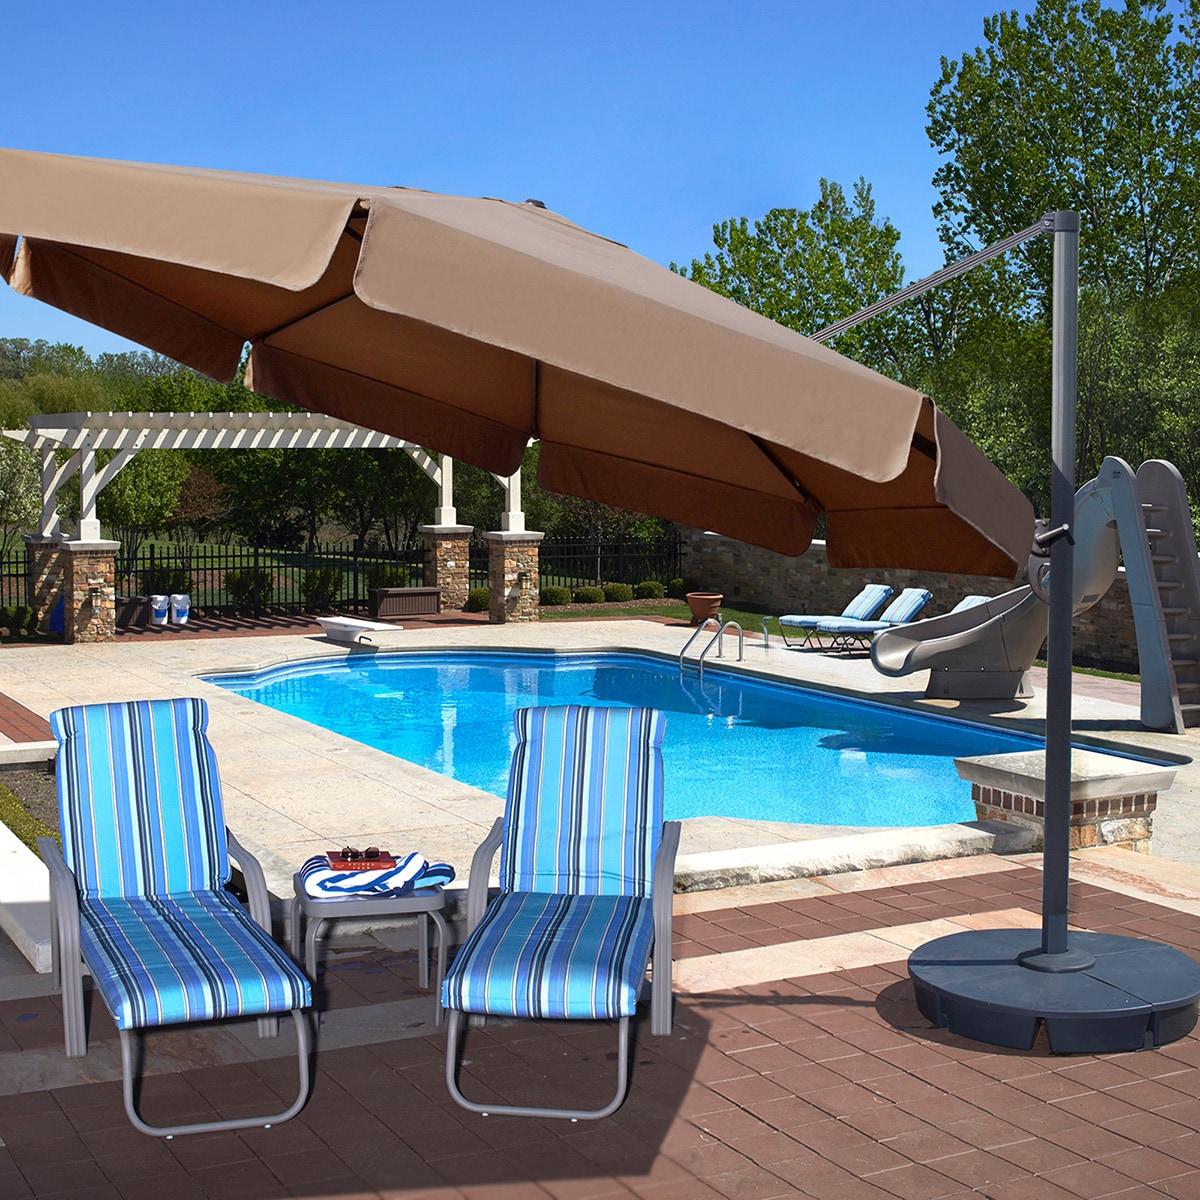 Victoria 13-ft Octagon Cantilever Umbrella with Valance in Sunbrella Acrylic